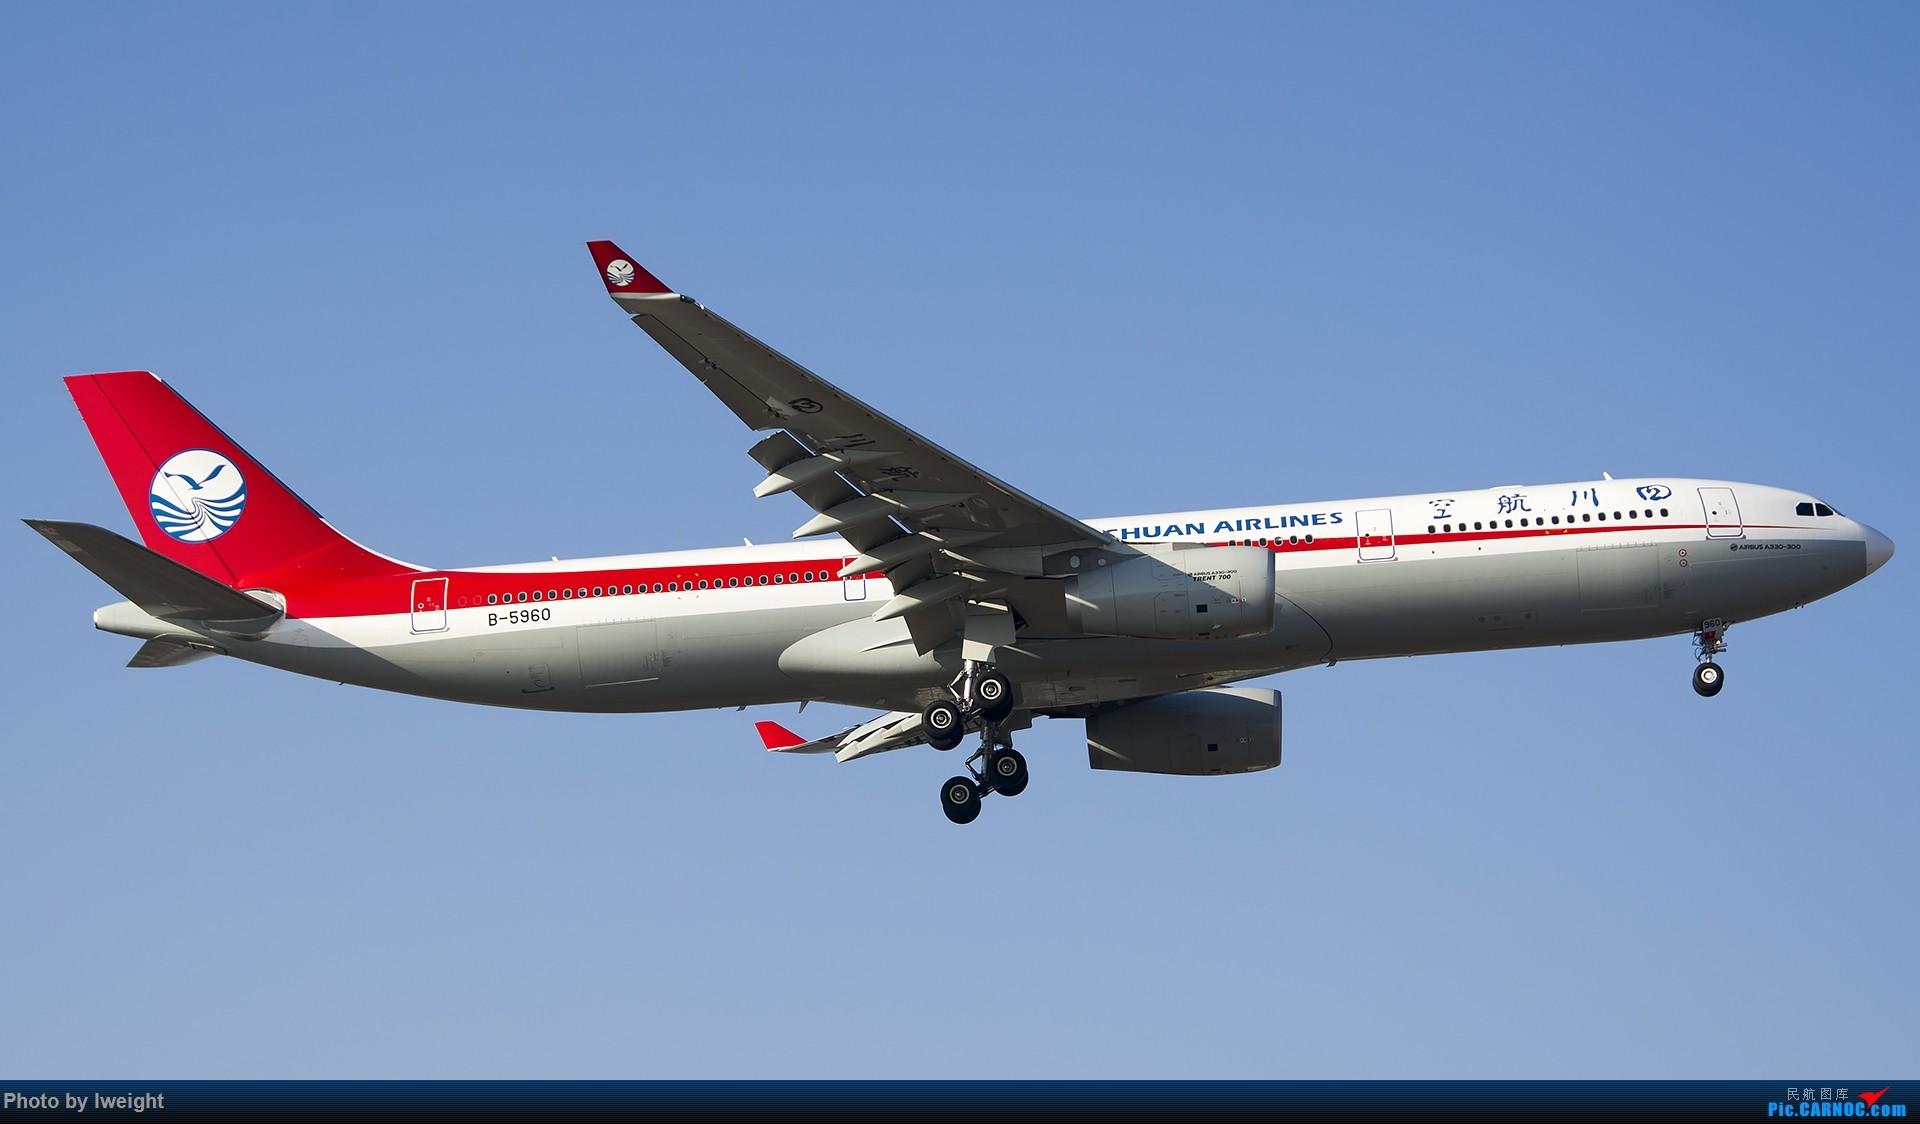 Re:[原创]庆祝升级777,发上今天在首都机场拍的所有飞机【2014-12-14】 AIRBUS A330-300 B-5960 中国北京首都国际机场